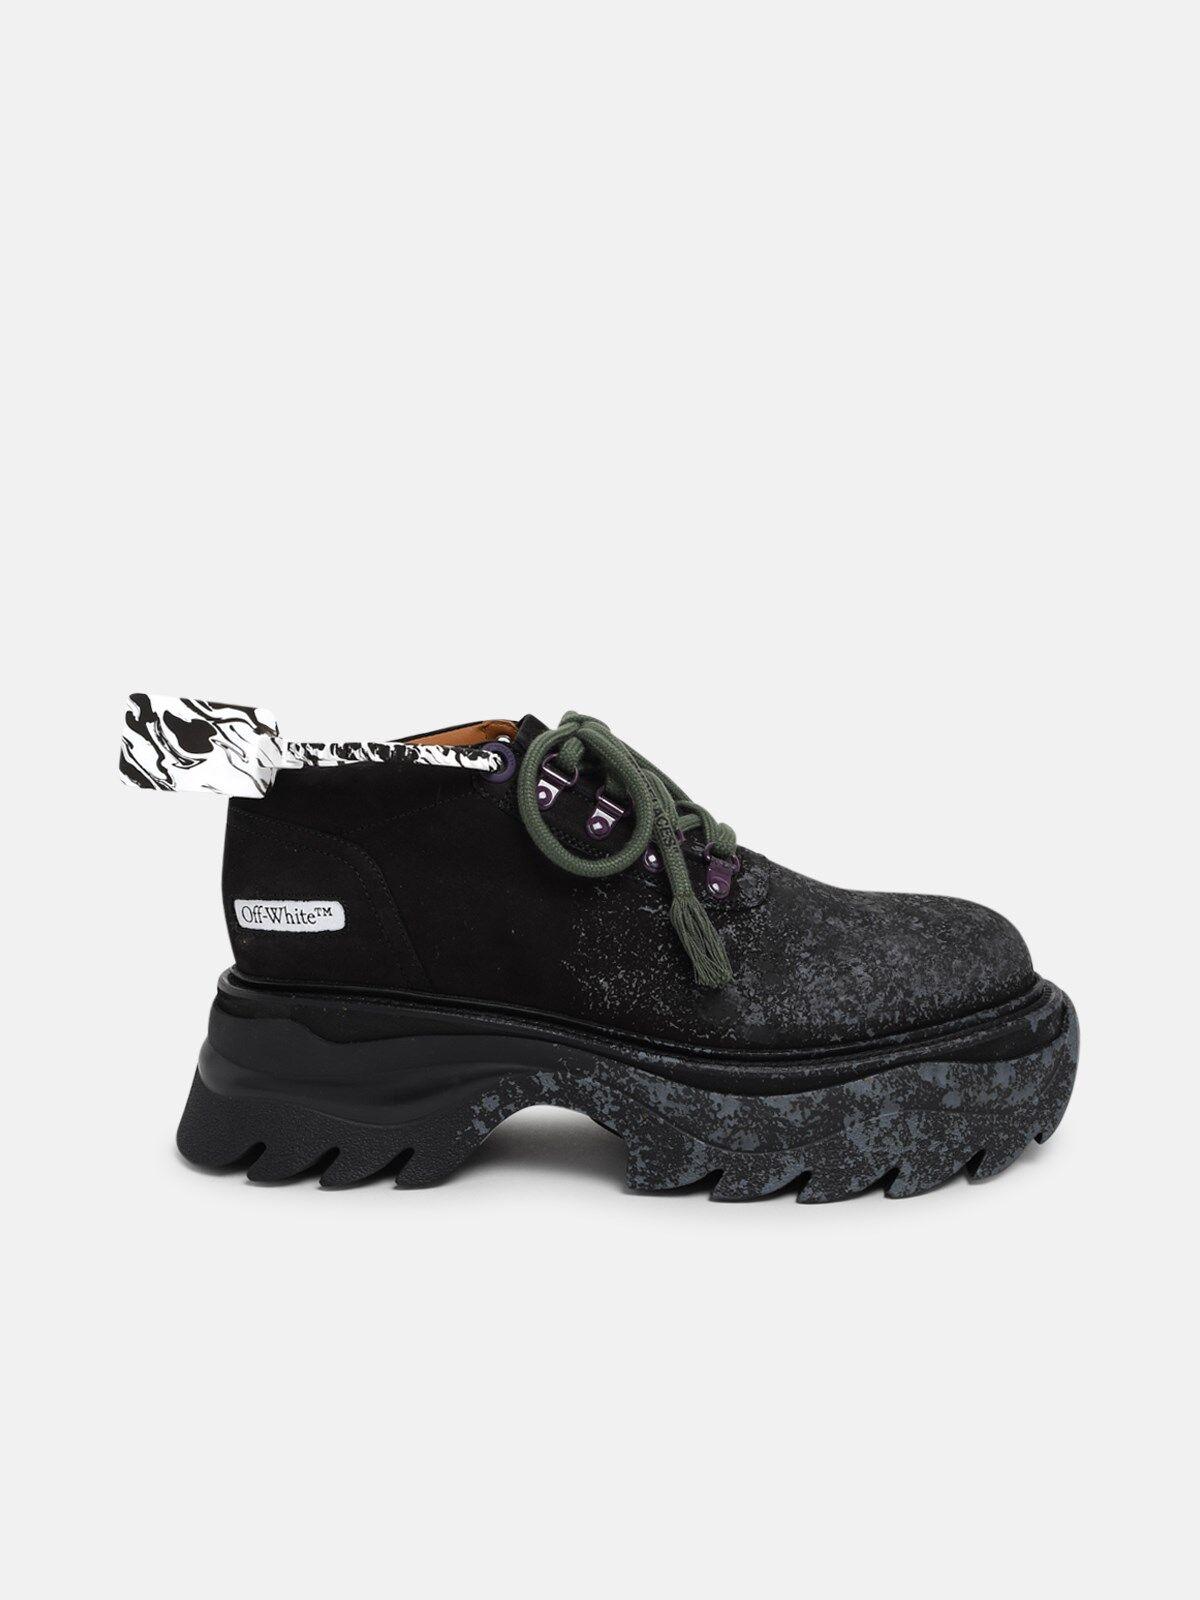 OFF WHITE Black Chunky Shoes (size: EU 43)